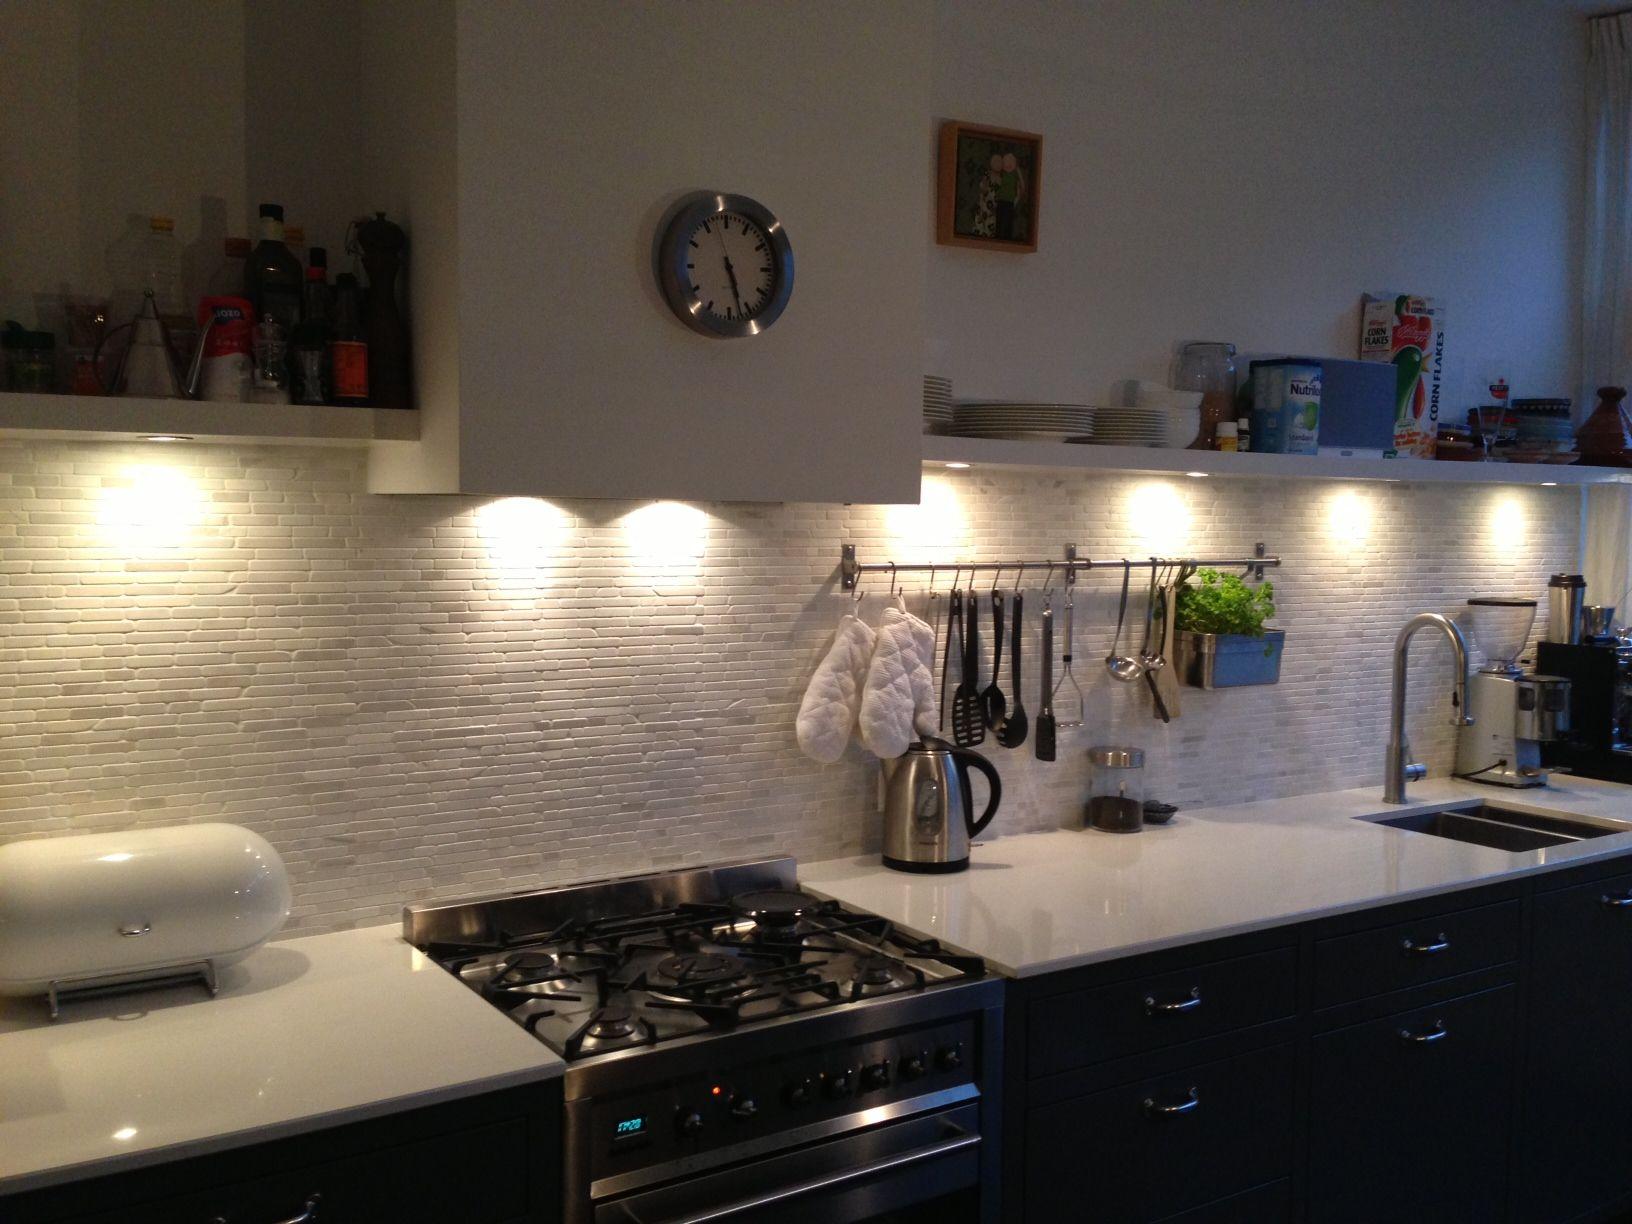 Achterwand Keuken Steenstrips : Achterwand fornuis tegeltjes google zoeken keuken pinterest